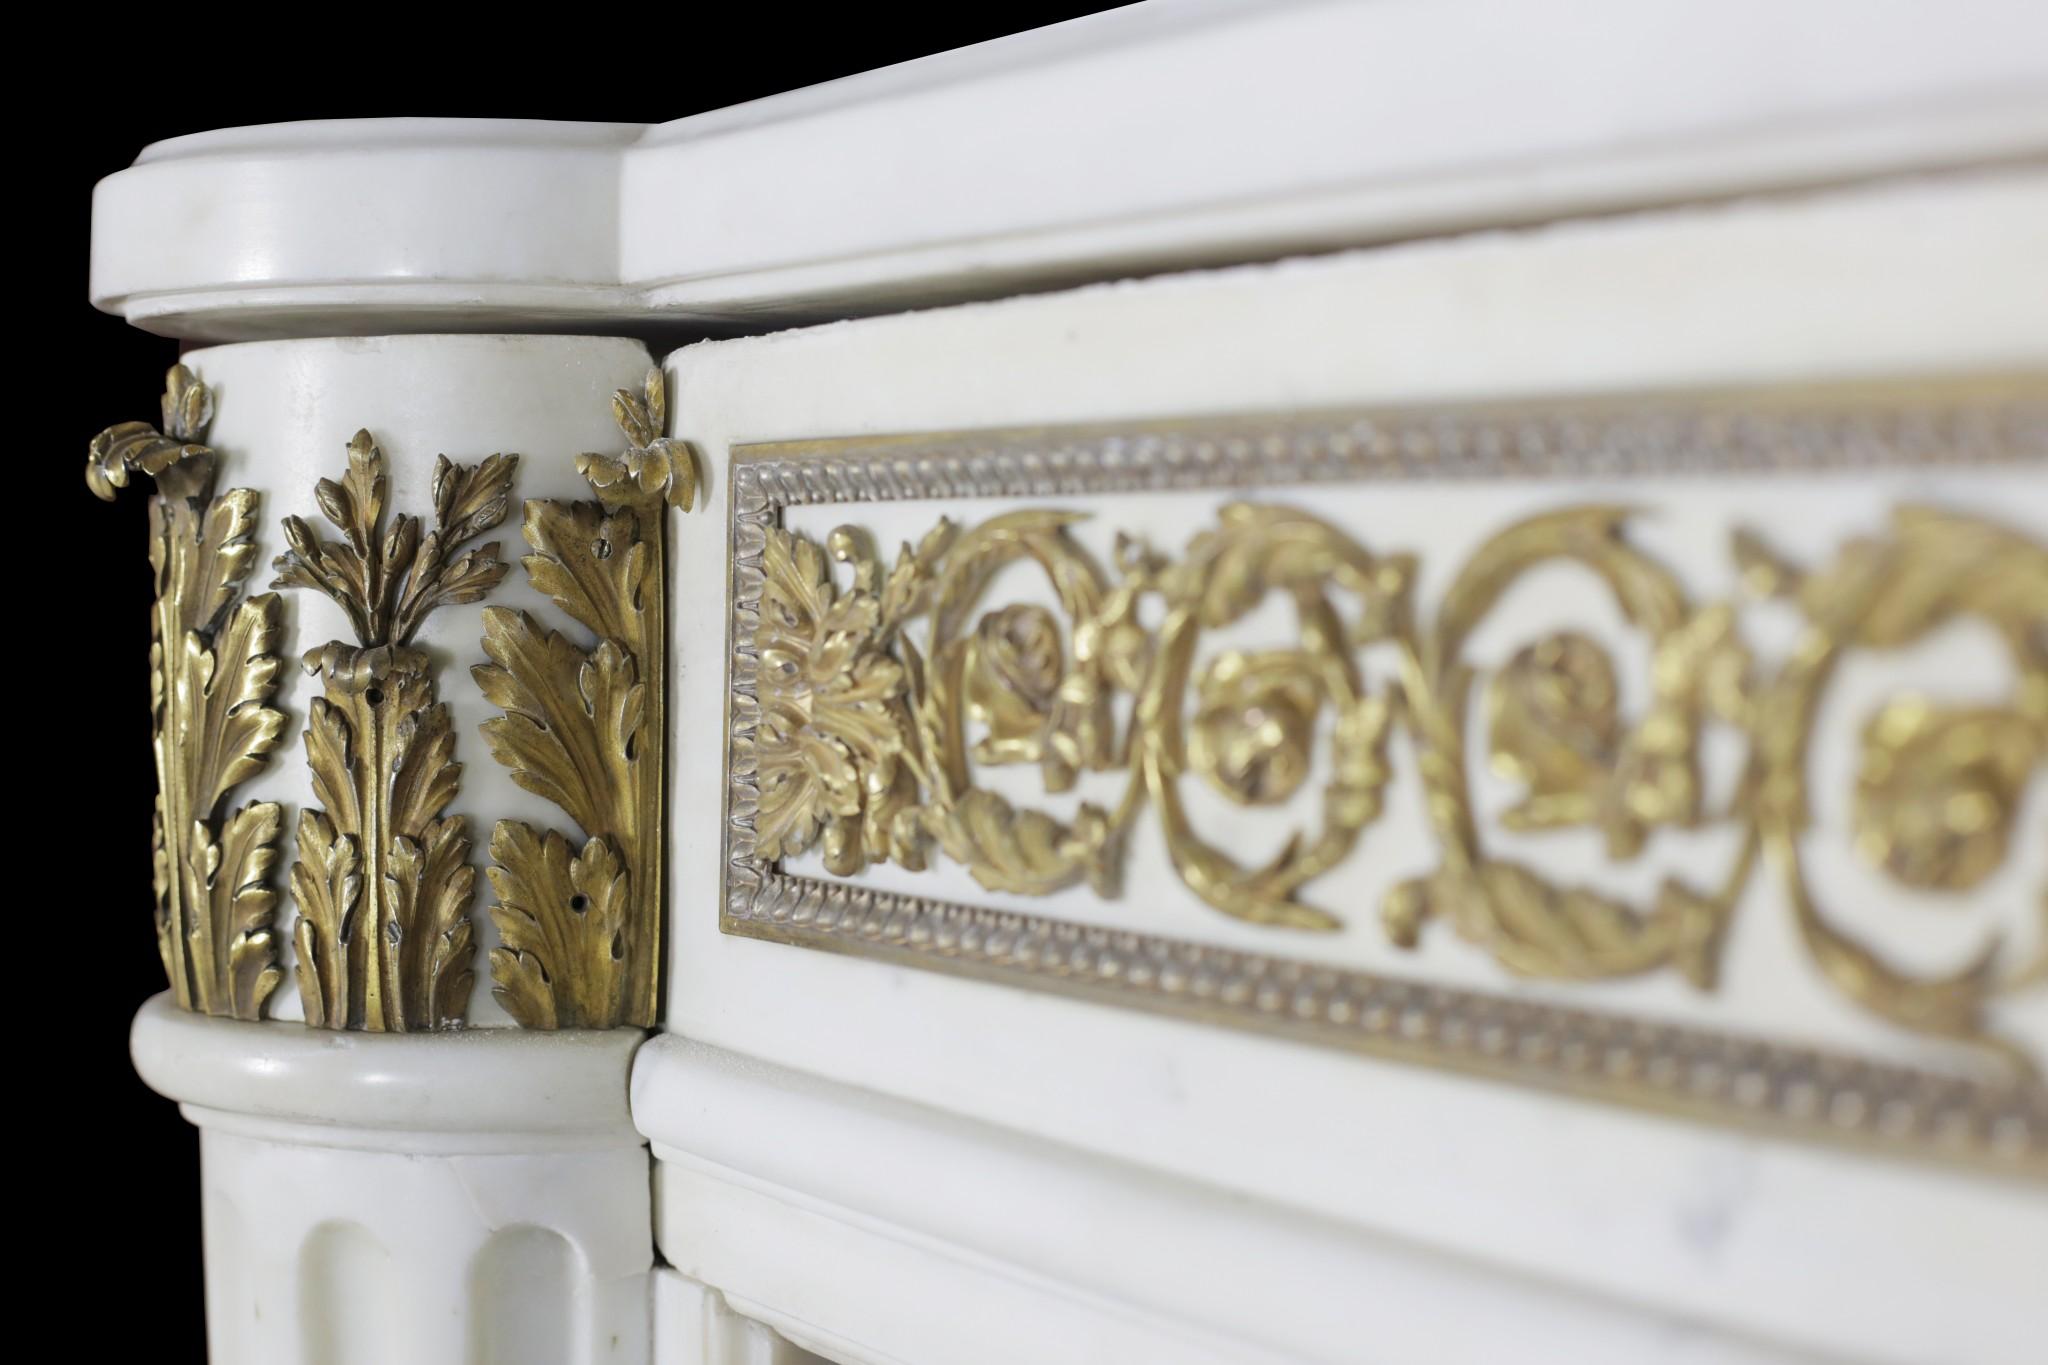 Statuary Marble And Ormolu Louis Xvi Fireplace Restoration